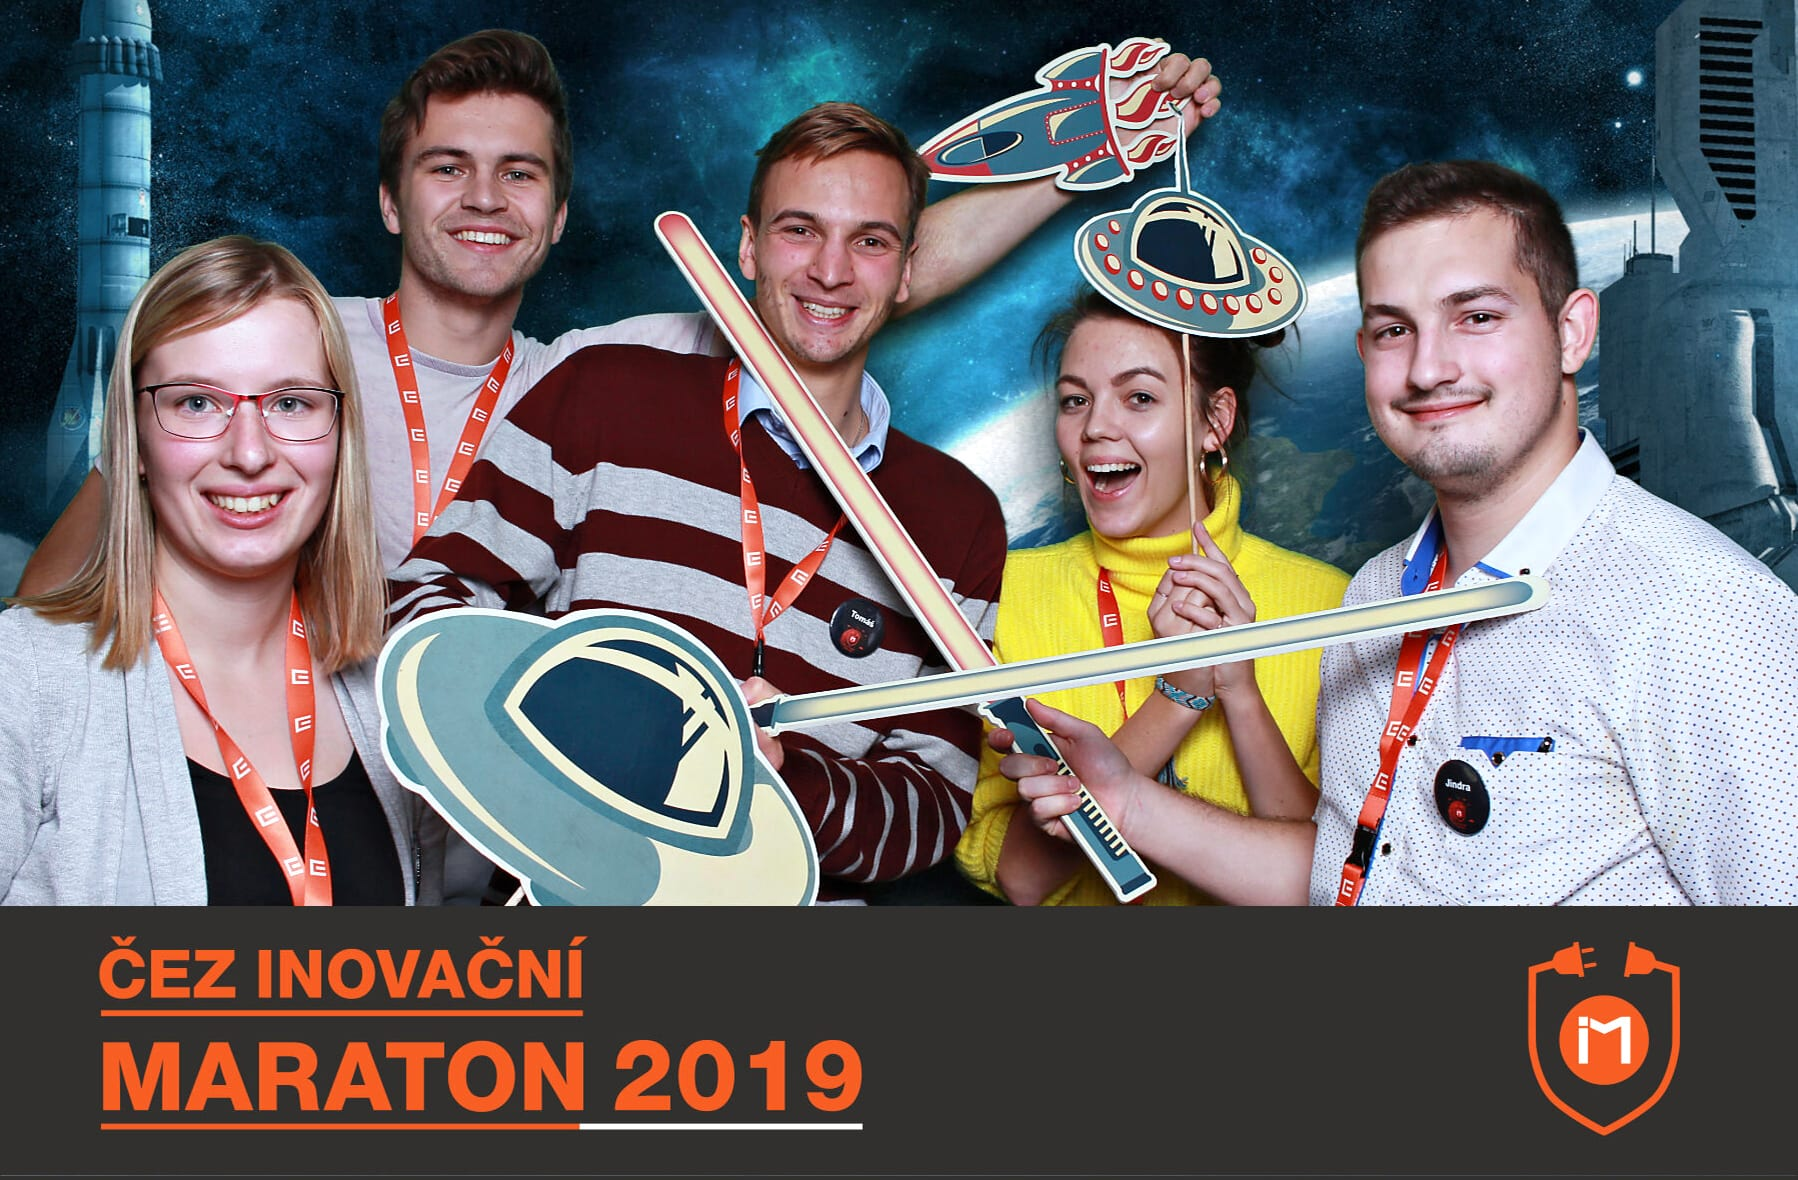 fotokoutek-konference-praha-cez-7-11-2019-668835